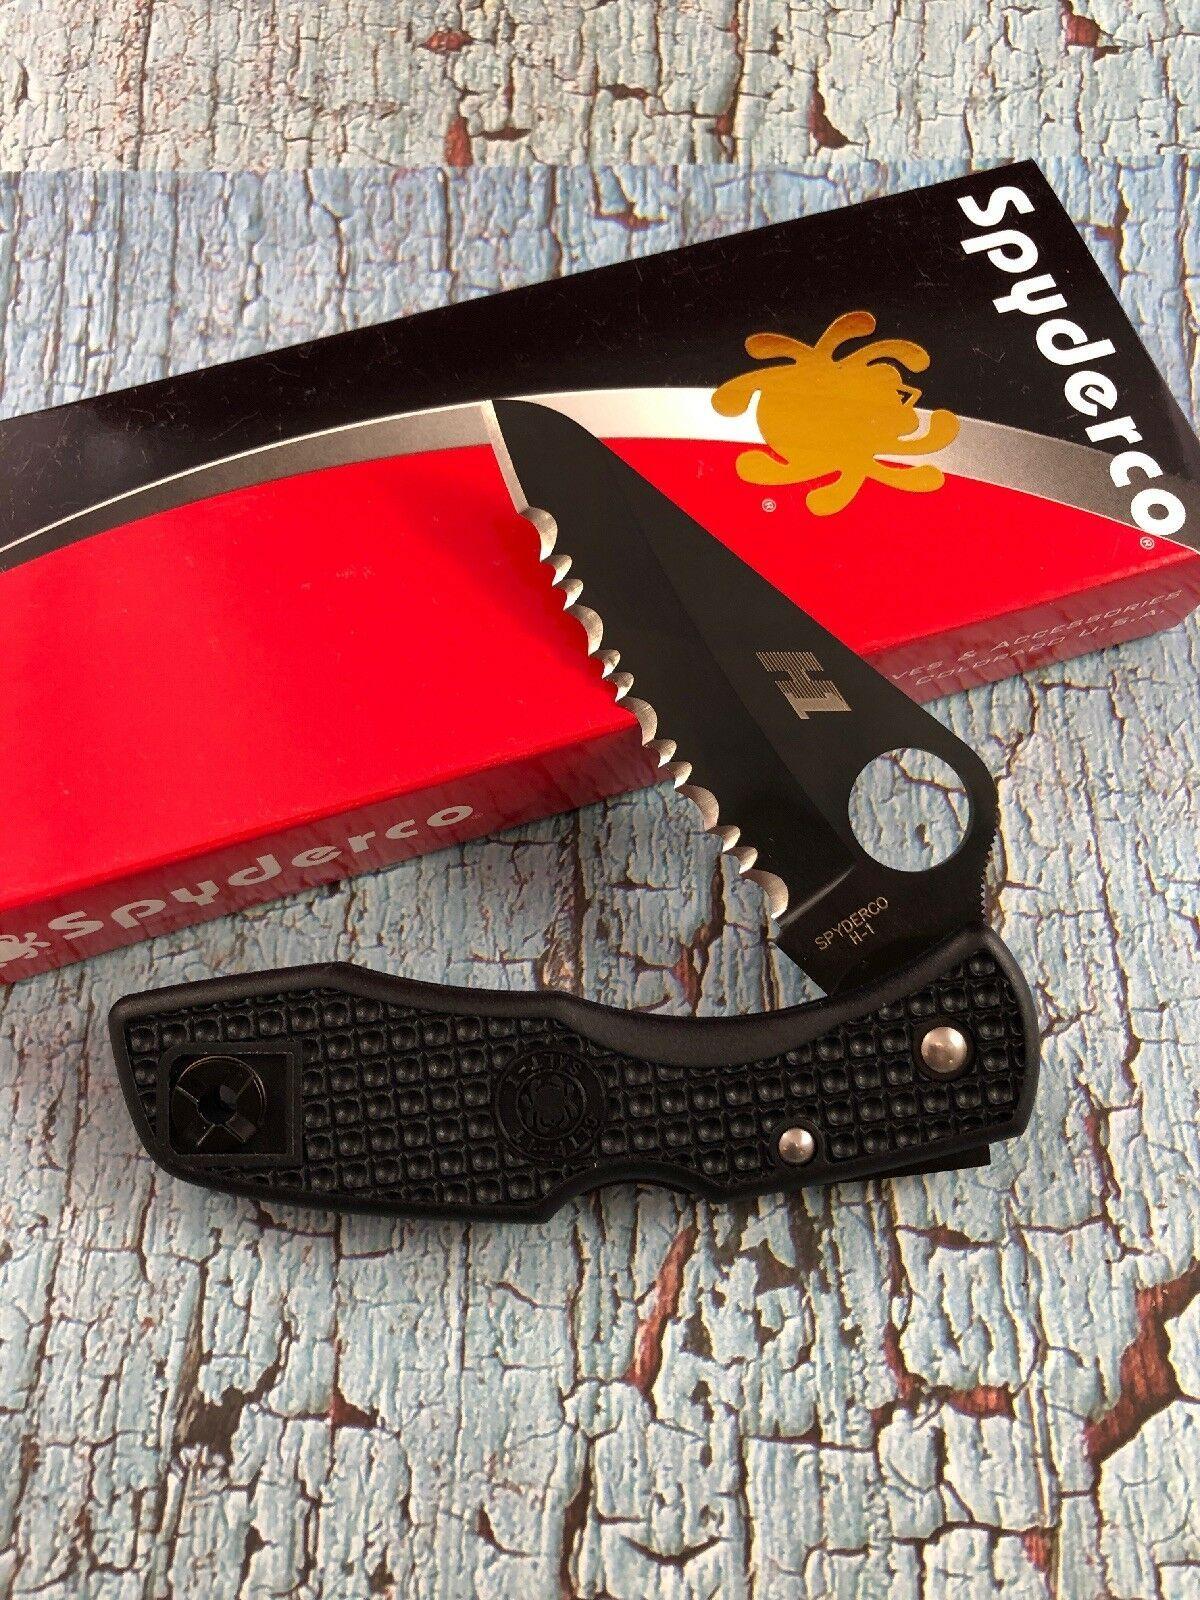 Фото 10 - Складной нож Salt 1 - Spyderco C88SBBK, сталь H-1 Black Titanium Nitride Serrated, рукоять термопластик FRN, чёрный